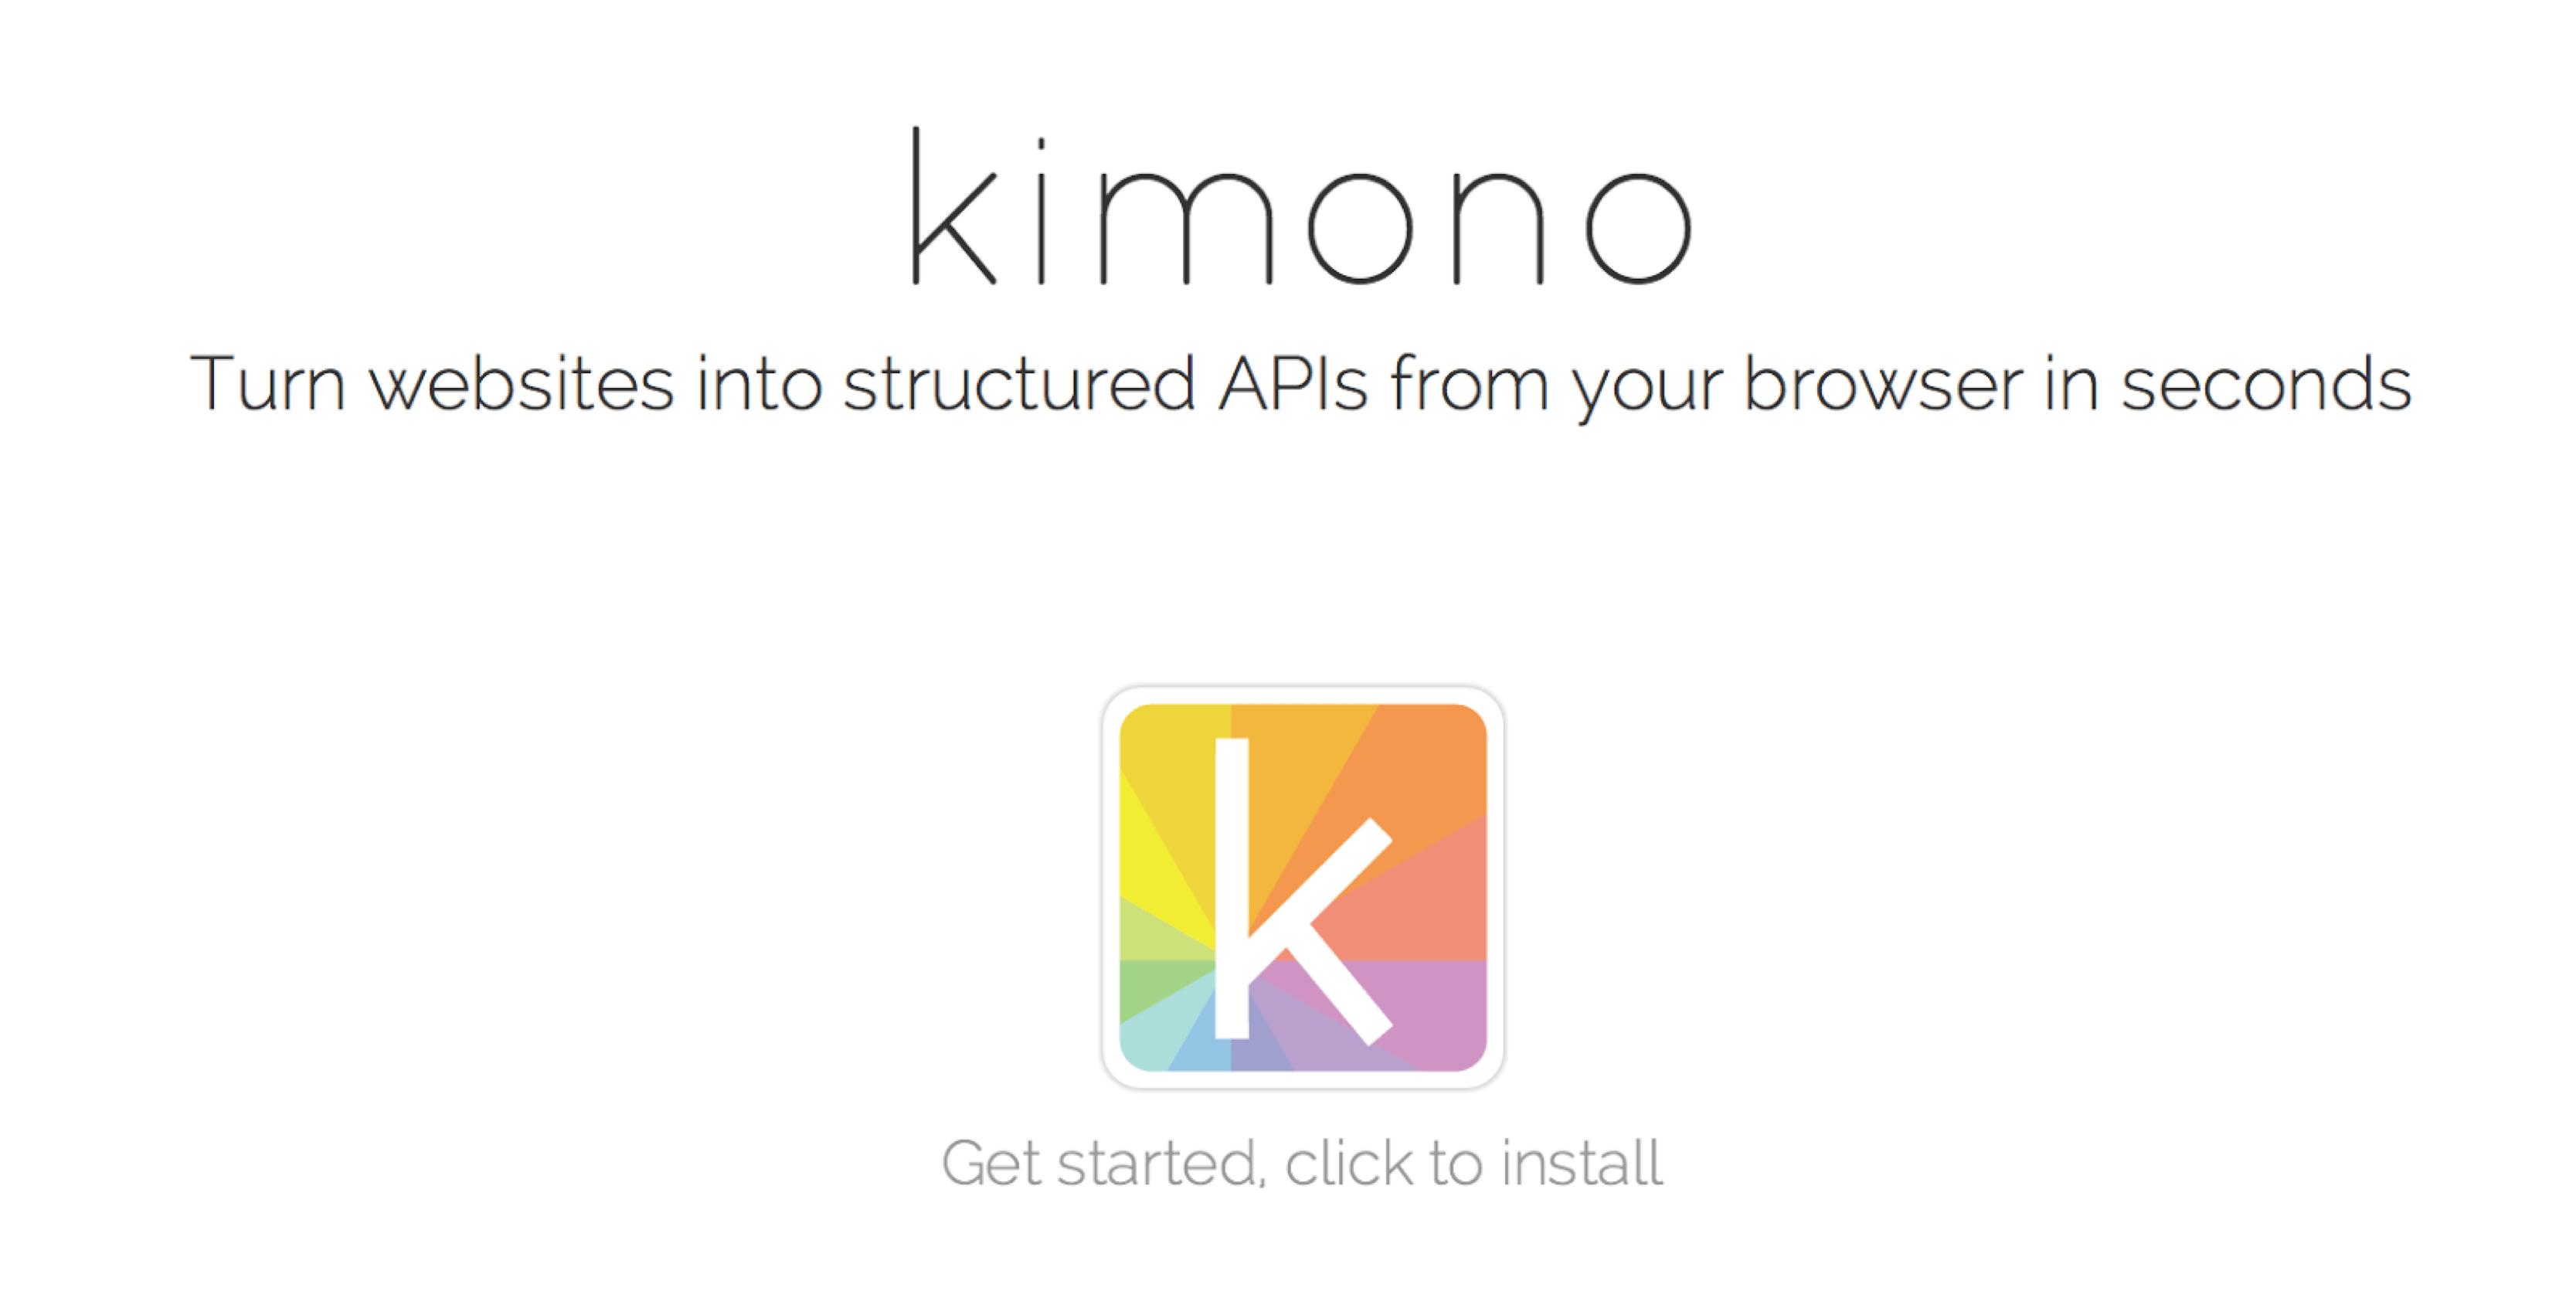 Palantir acquires Kimono Labs, will shutter data collection service